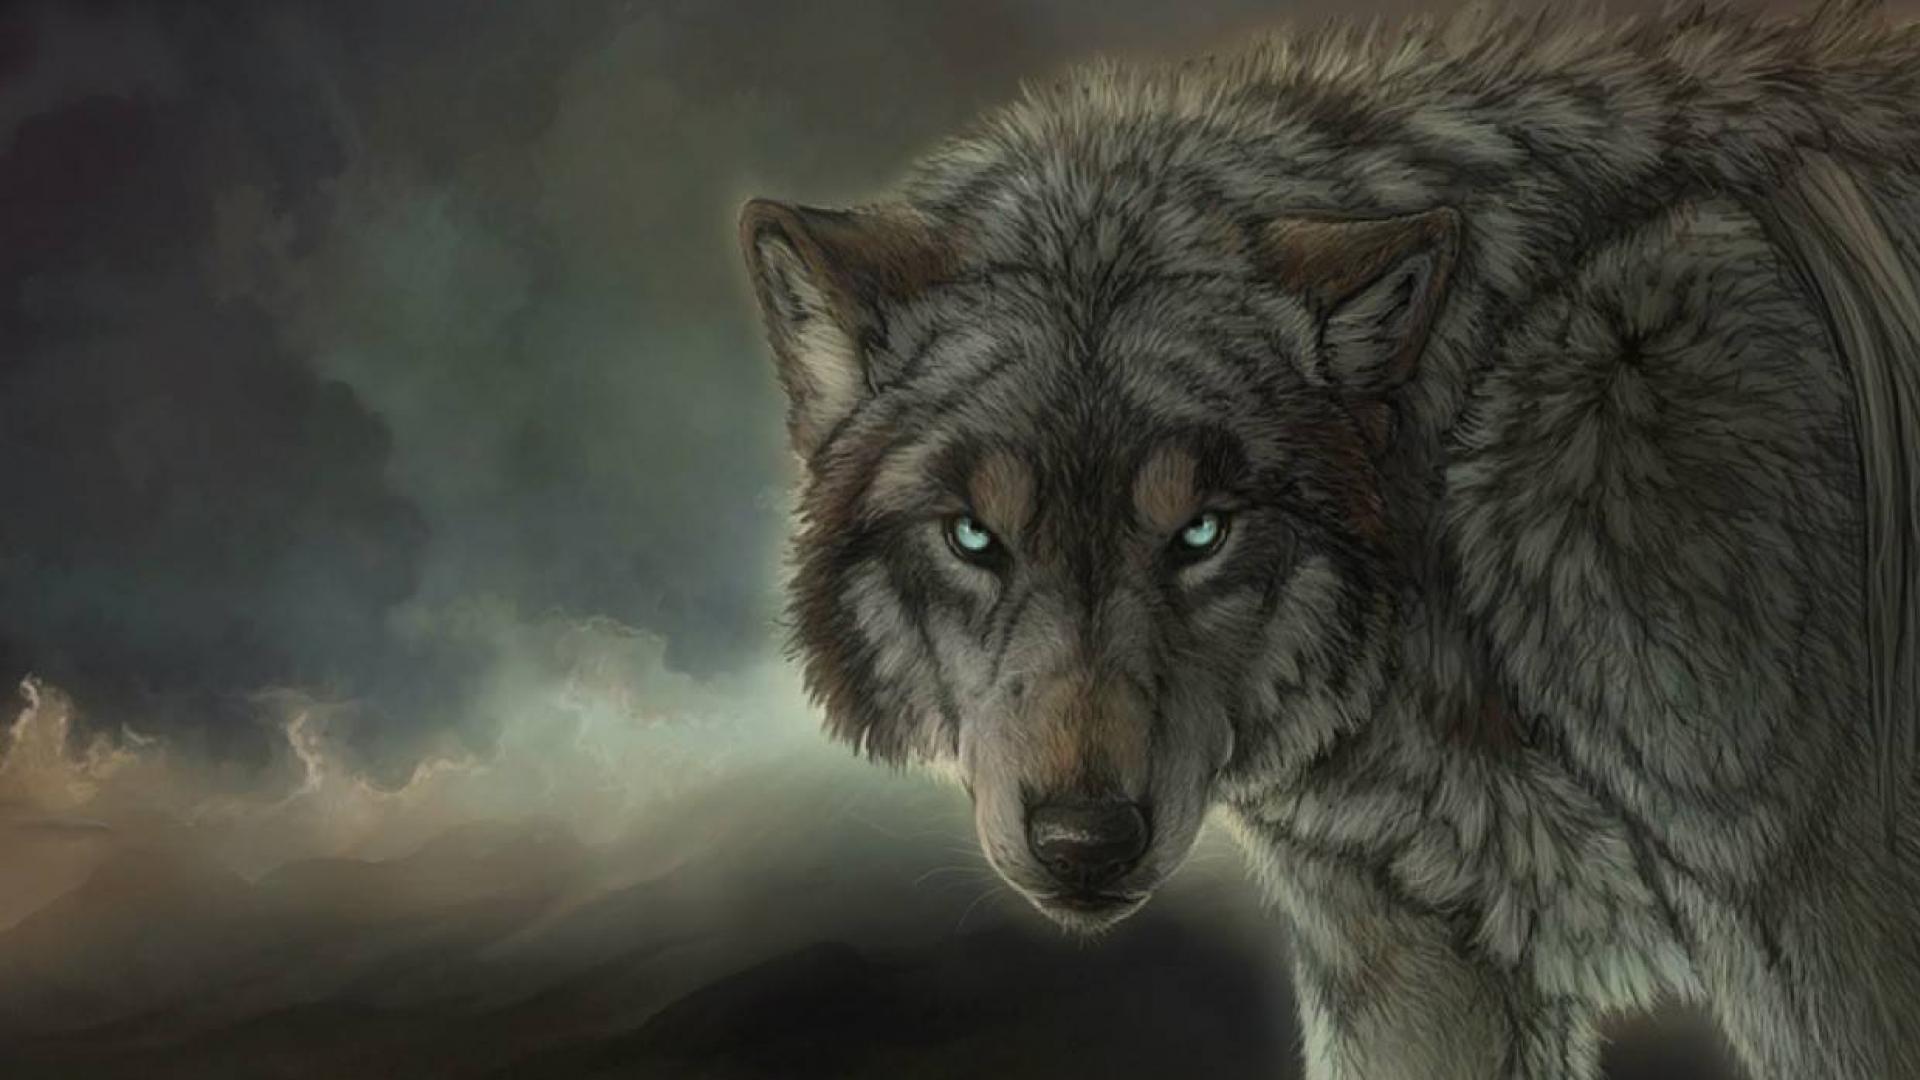 Res: 1920x1080, Desktop Wolf Wallpaper HD.